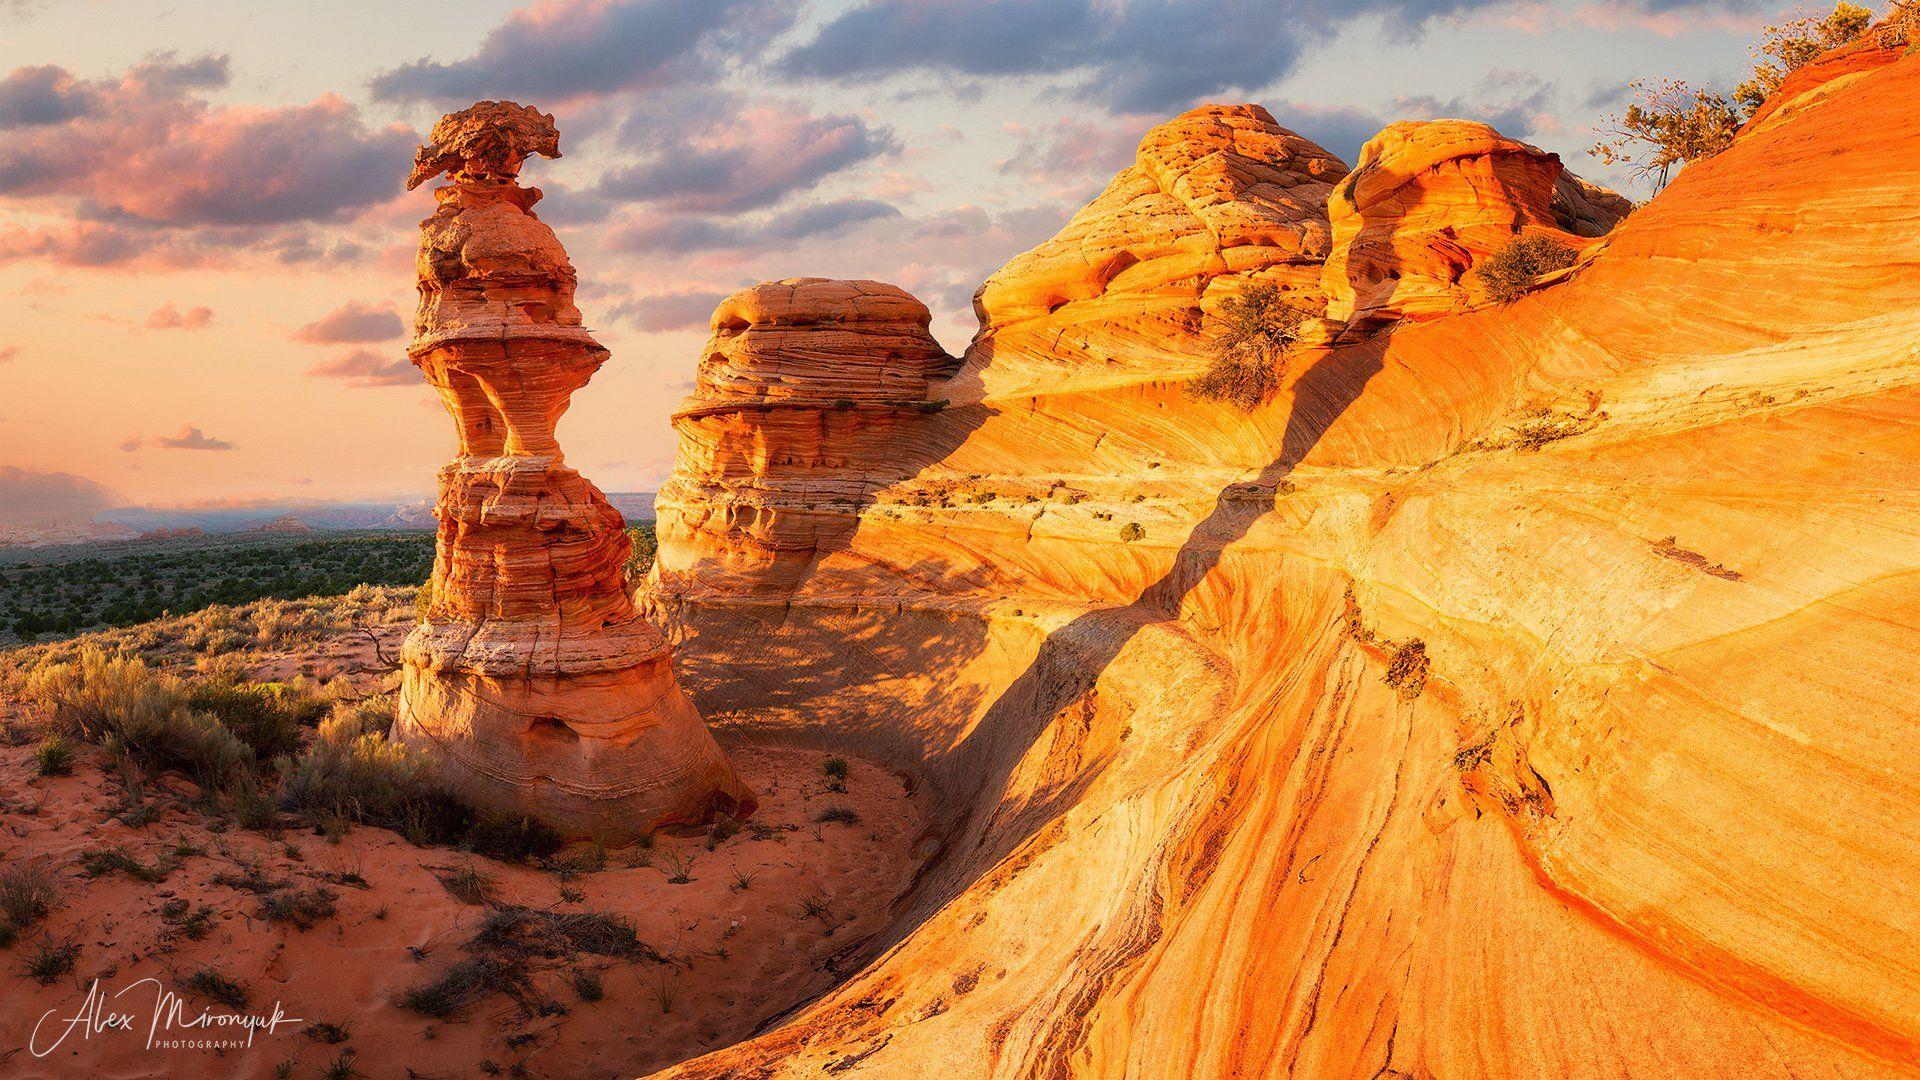 сша, каньон, аризона, юта, пустыня, абстракция,  свет,  индейцы, навахо, волна, закат, панорама, колонна, песчаник, скала, дюна,, Alex Mironyuk